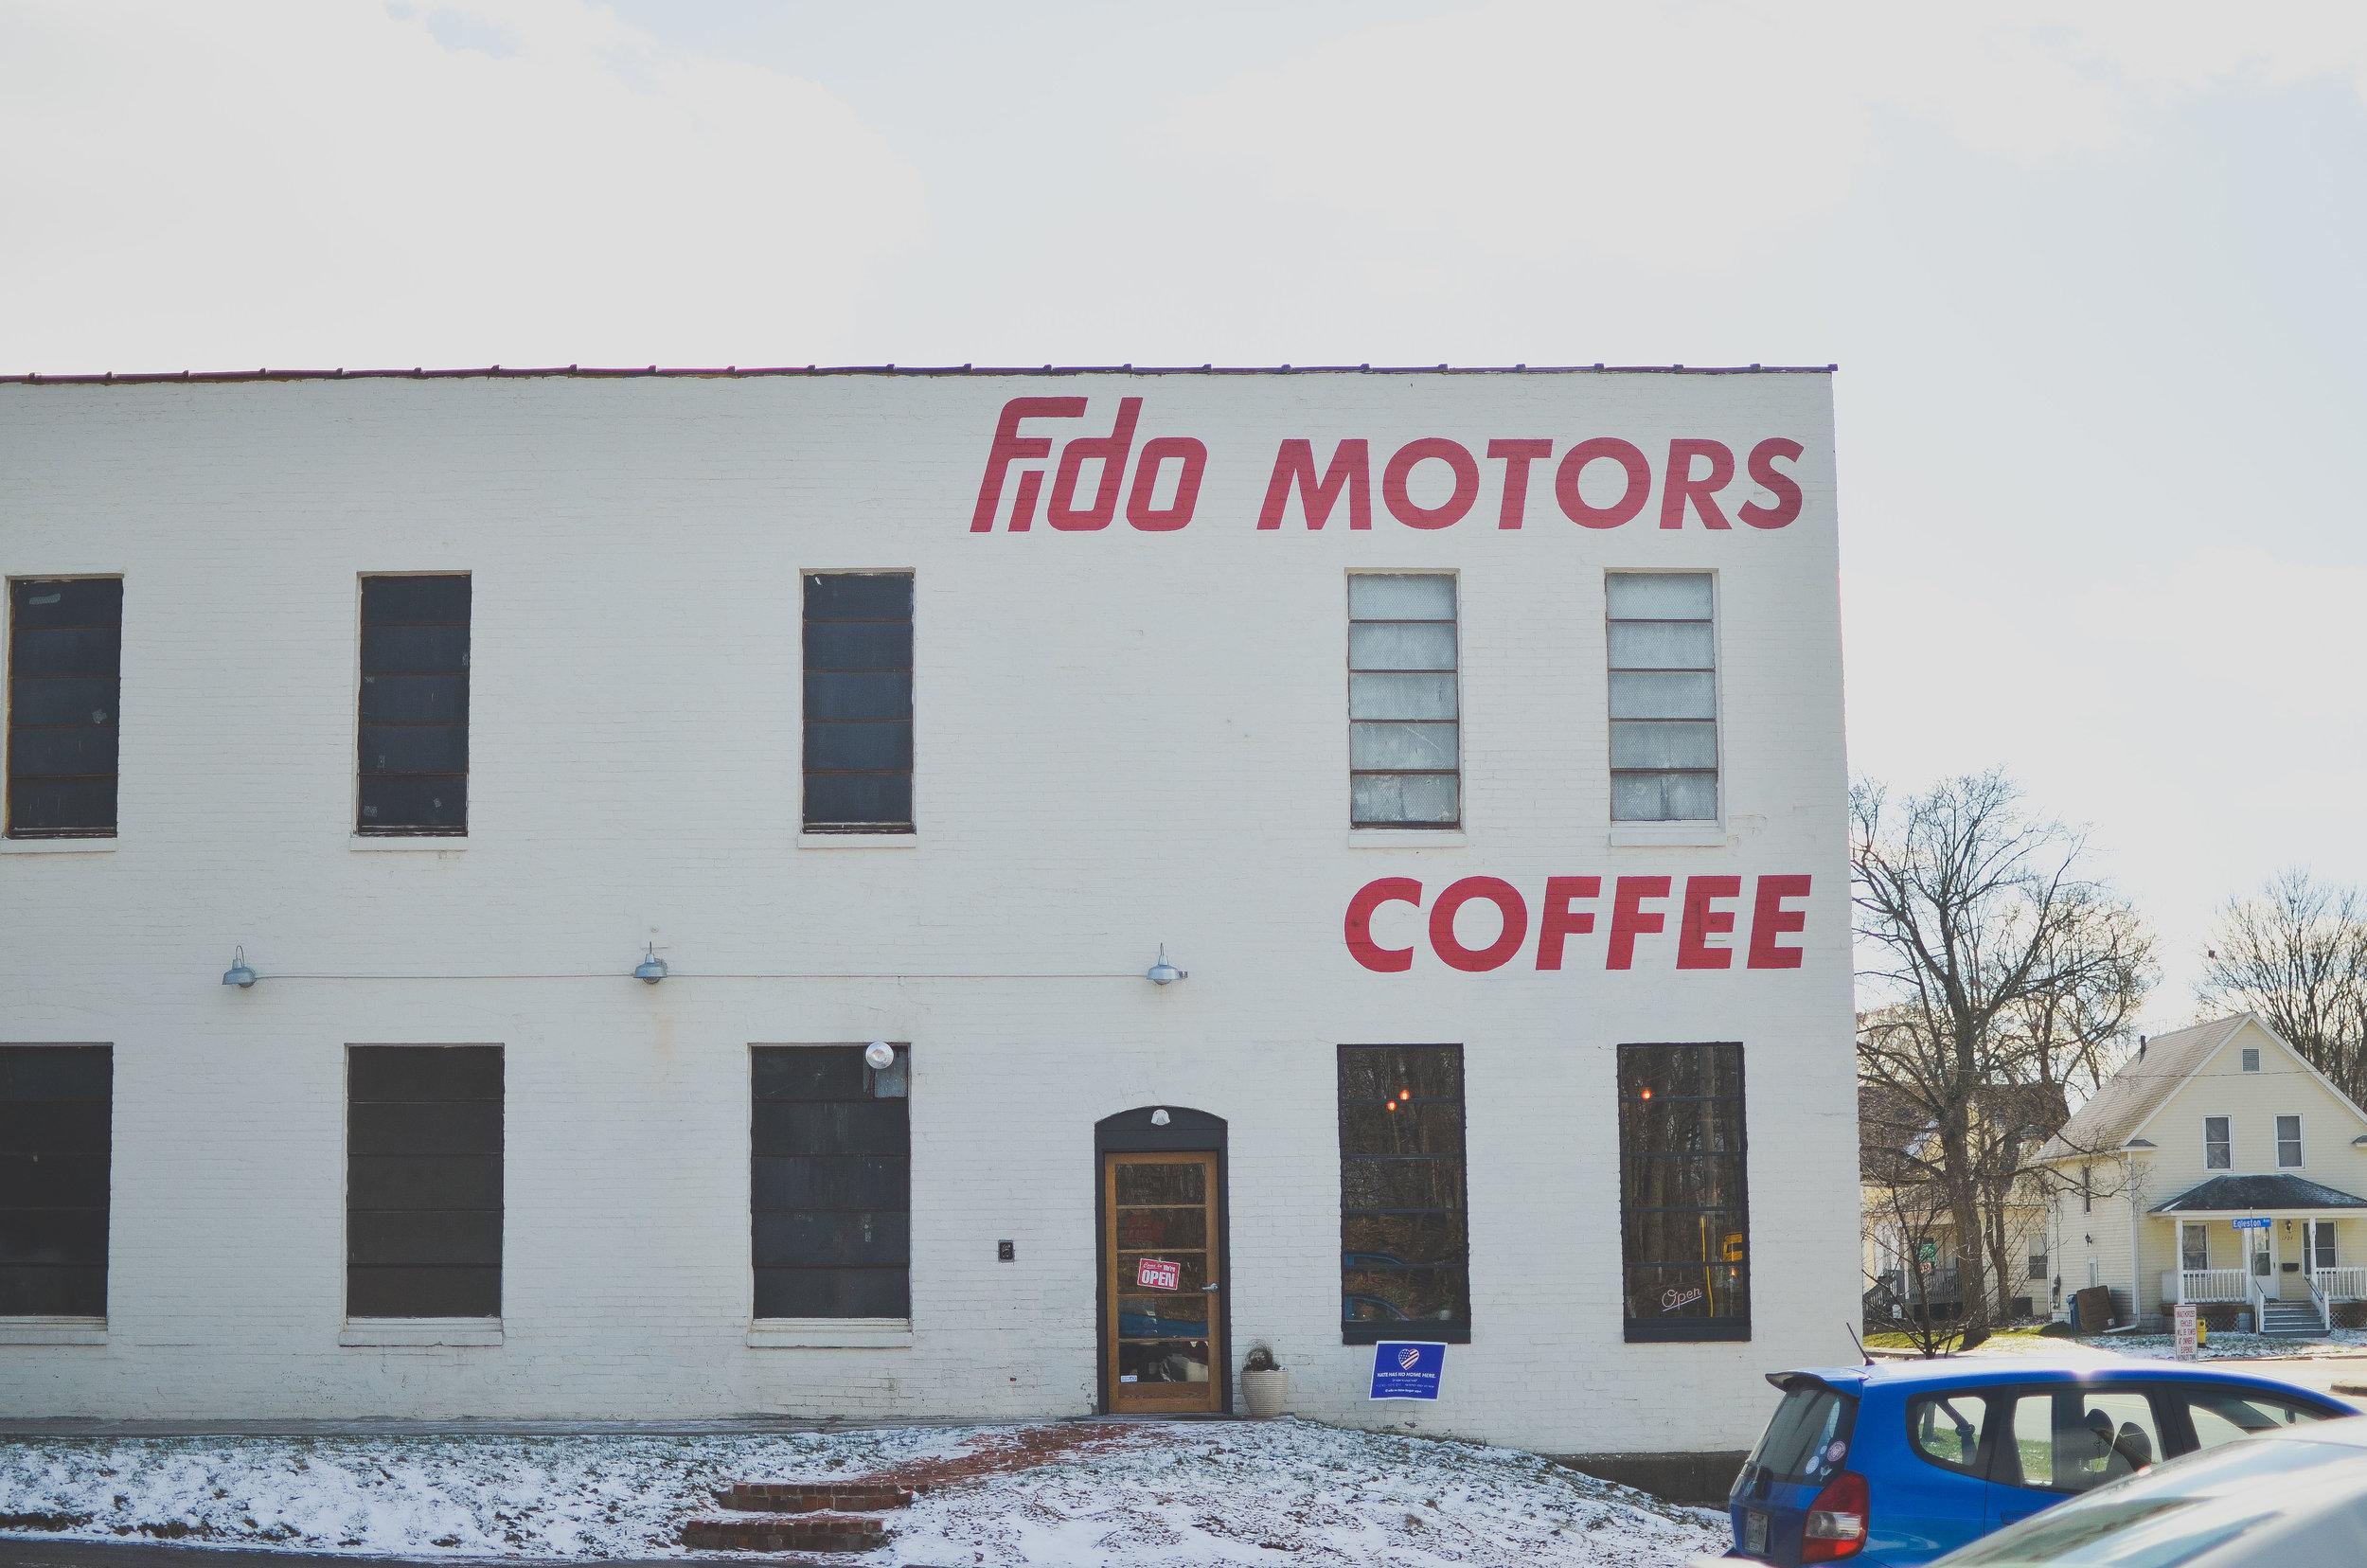 Wendling_Boyd_Fido_Motors_Coffee-16.jpg